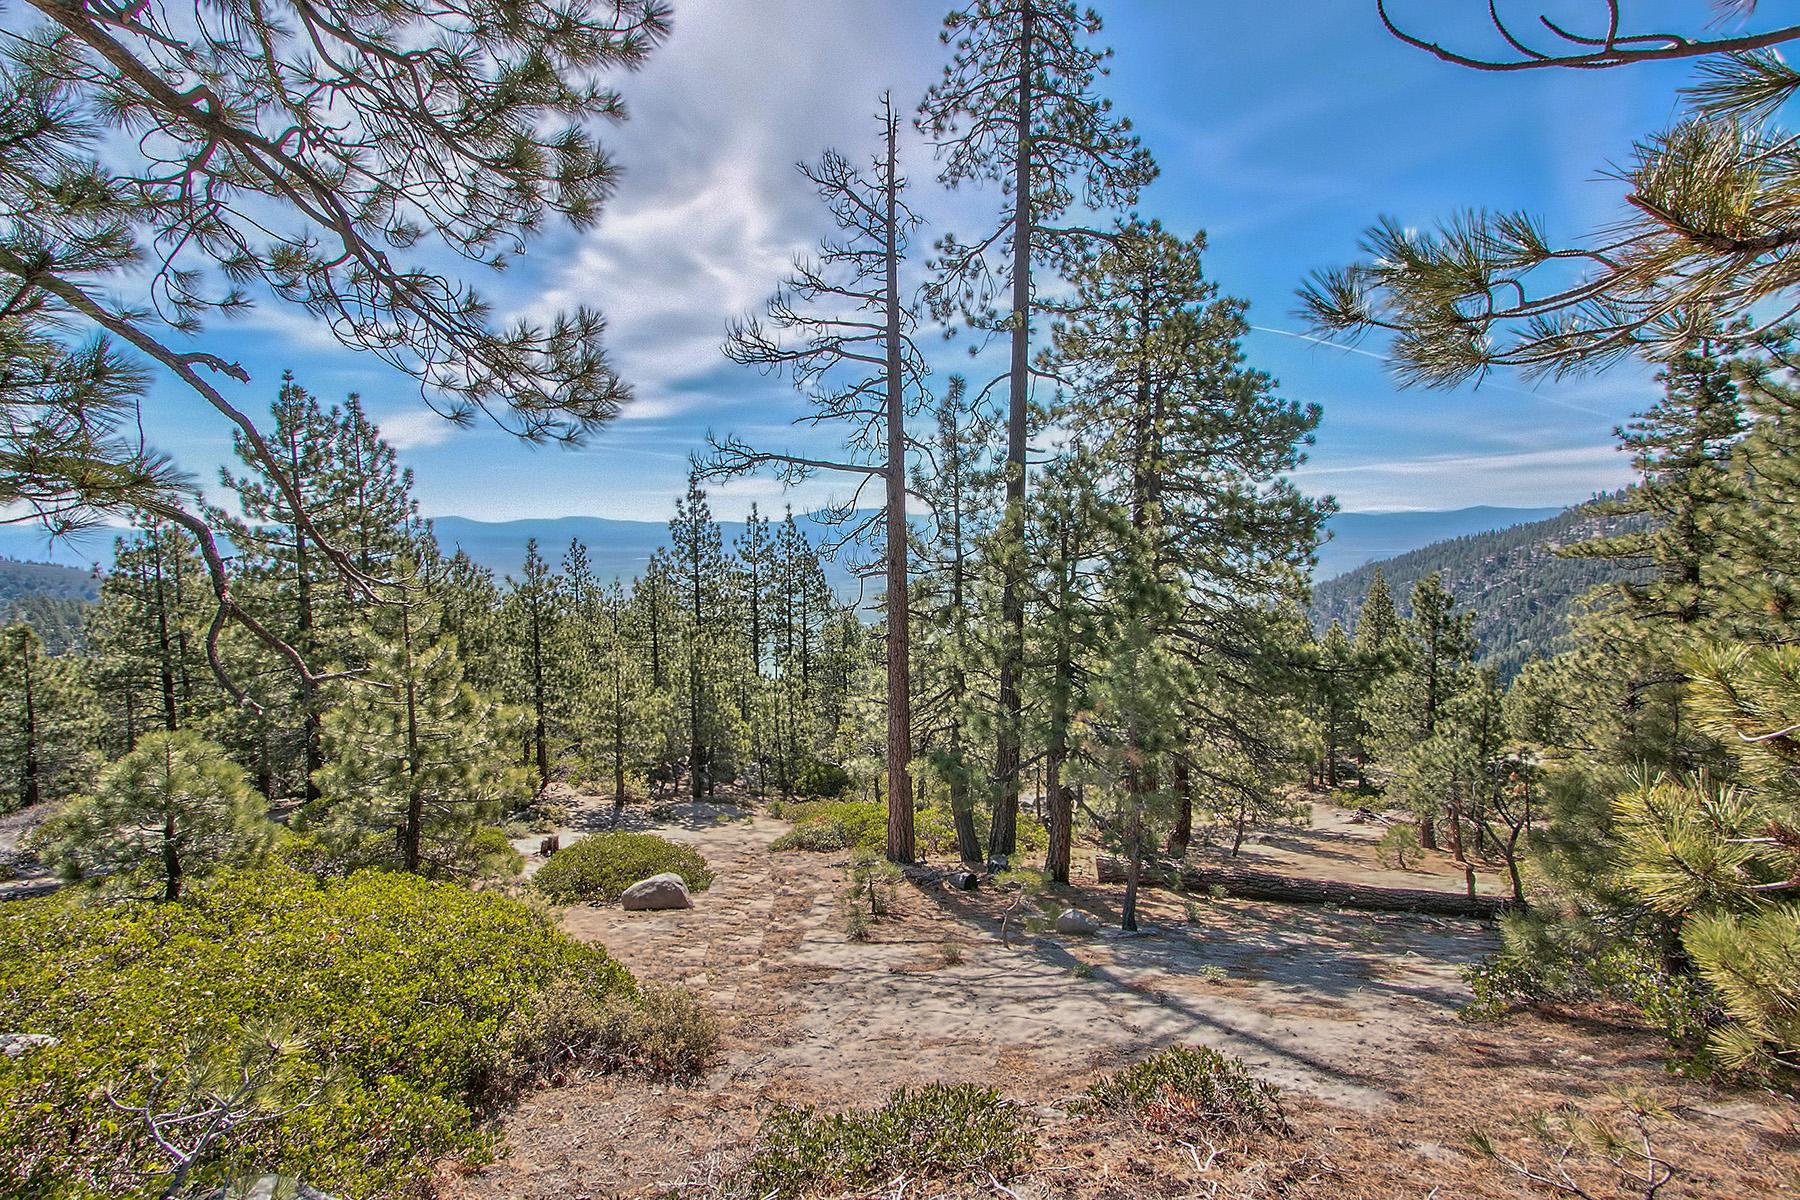 Land for Sale at 0 Kingsbury Grade Stateline, Nevada 89449 United States